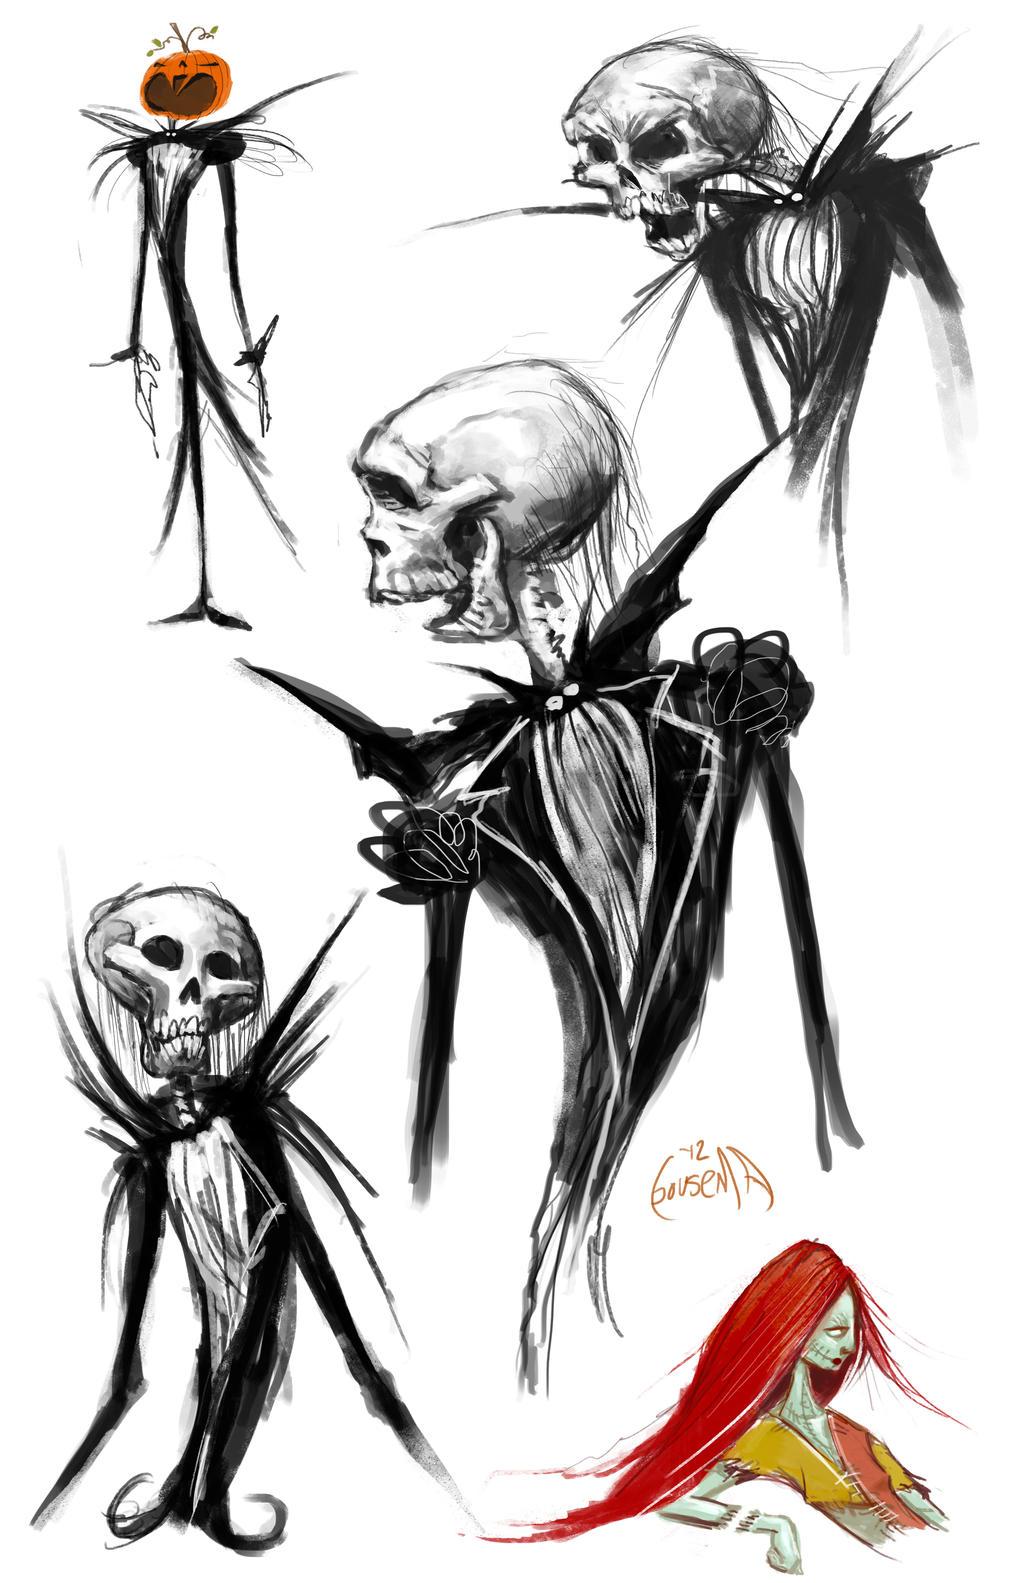 NIghtmare sketches by JamesBousema on DeviantArt